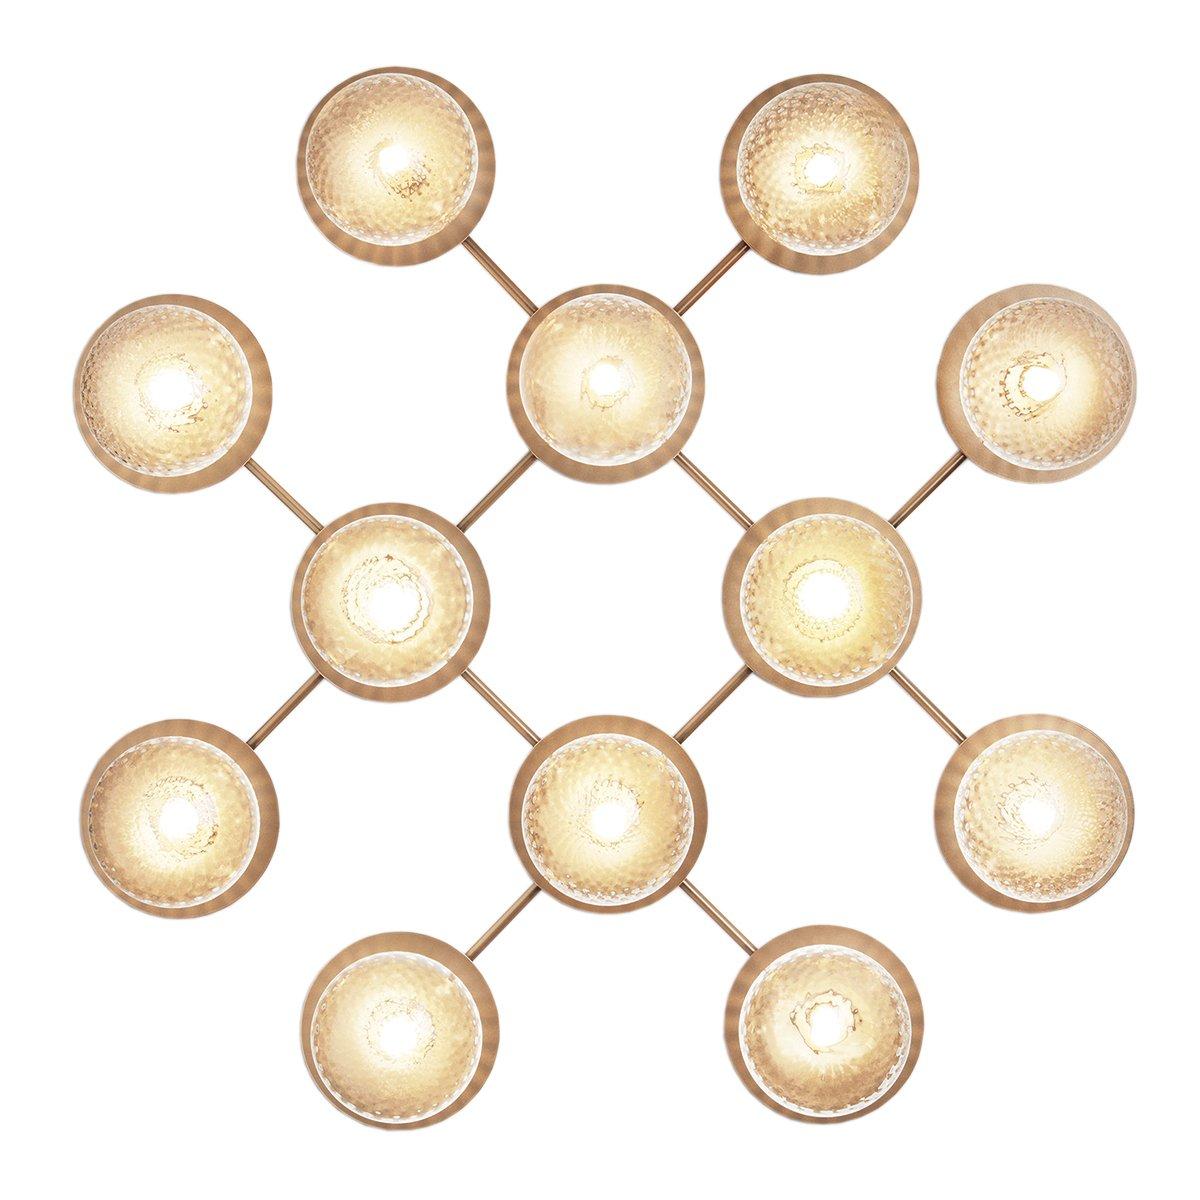 Nuura Liila 12 Wand- & Plafondlamp - Nordic Gold - Optic Clear